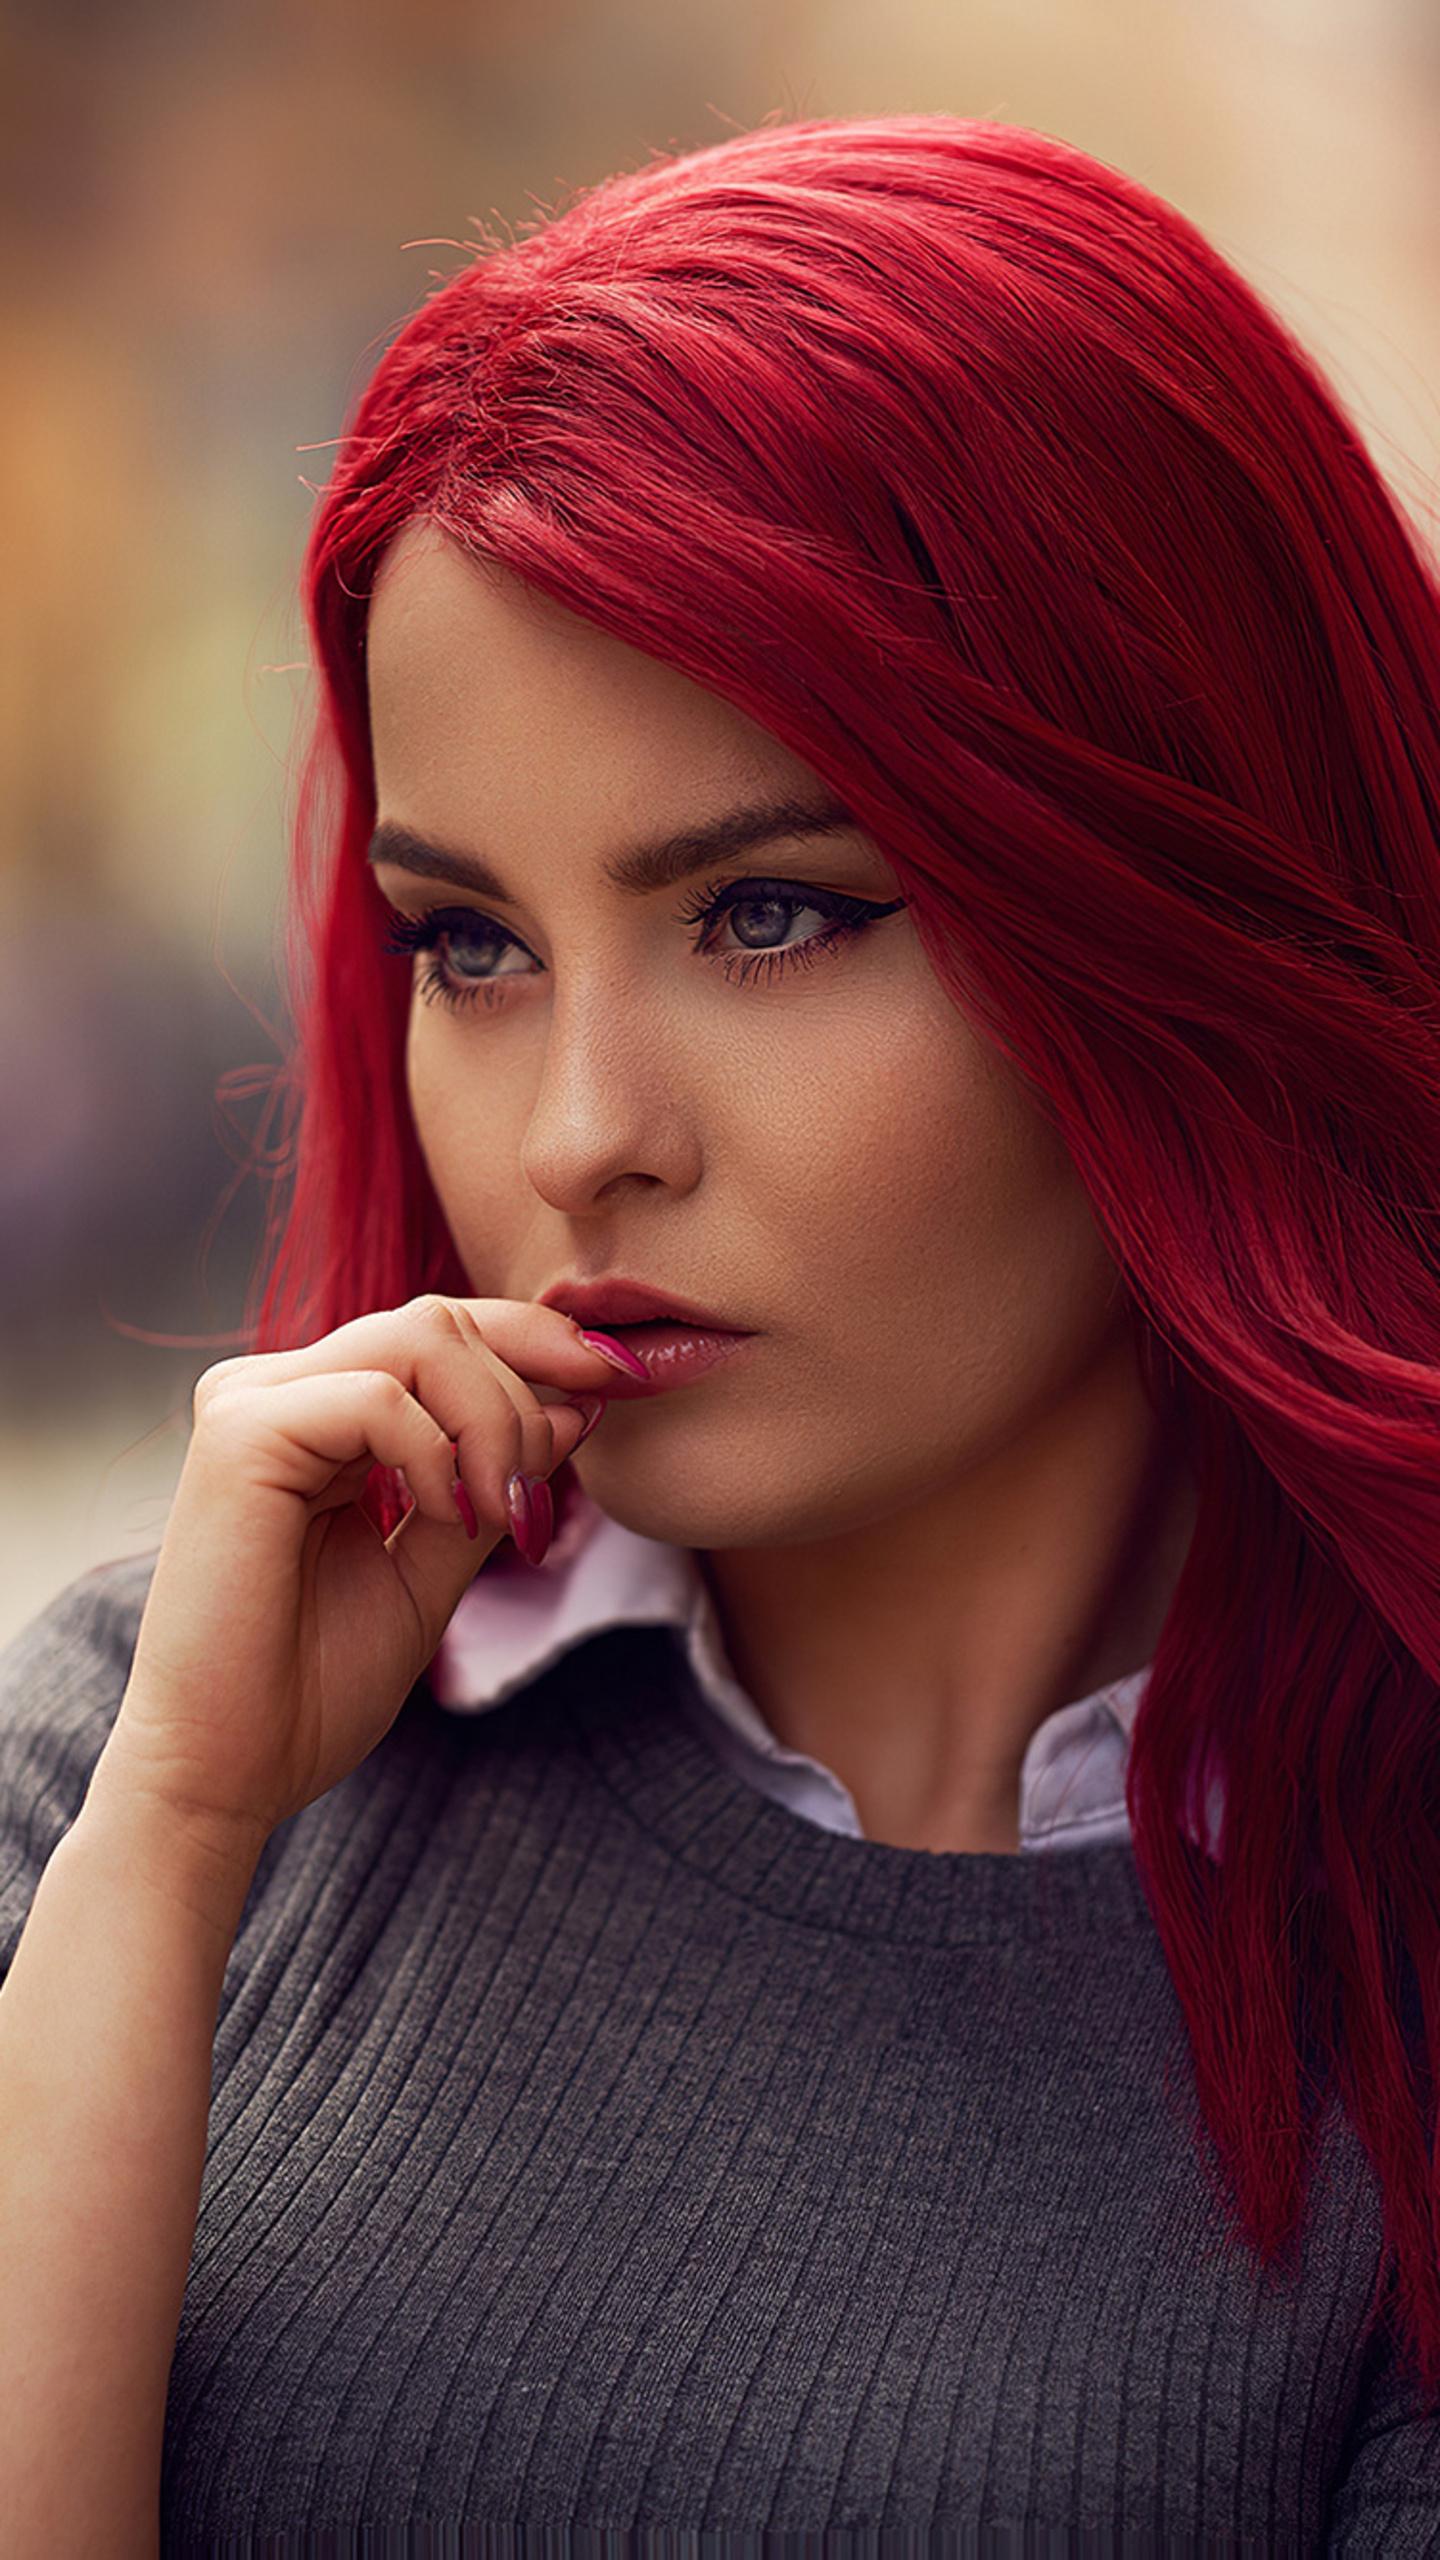 red-head-girl-outdoor-mo.jpg